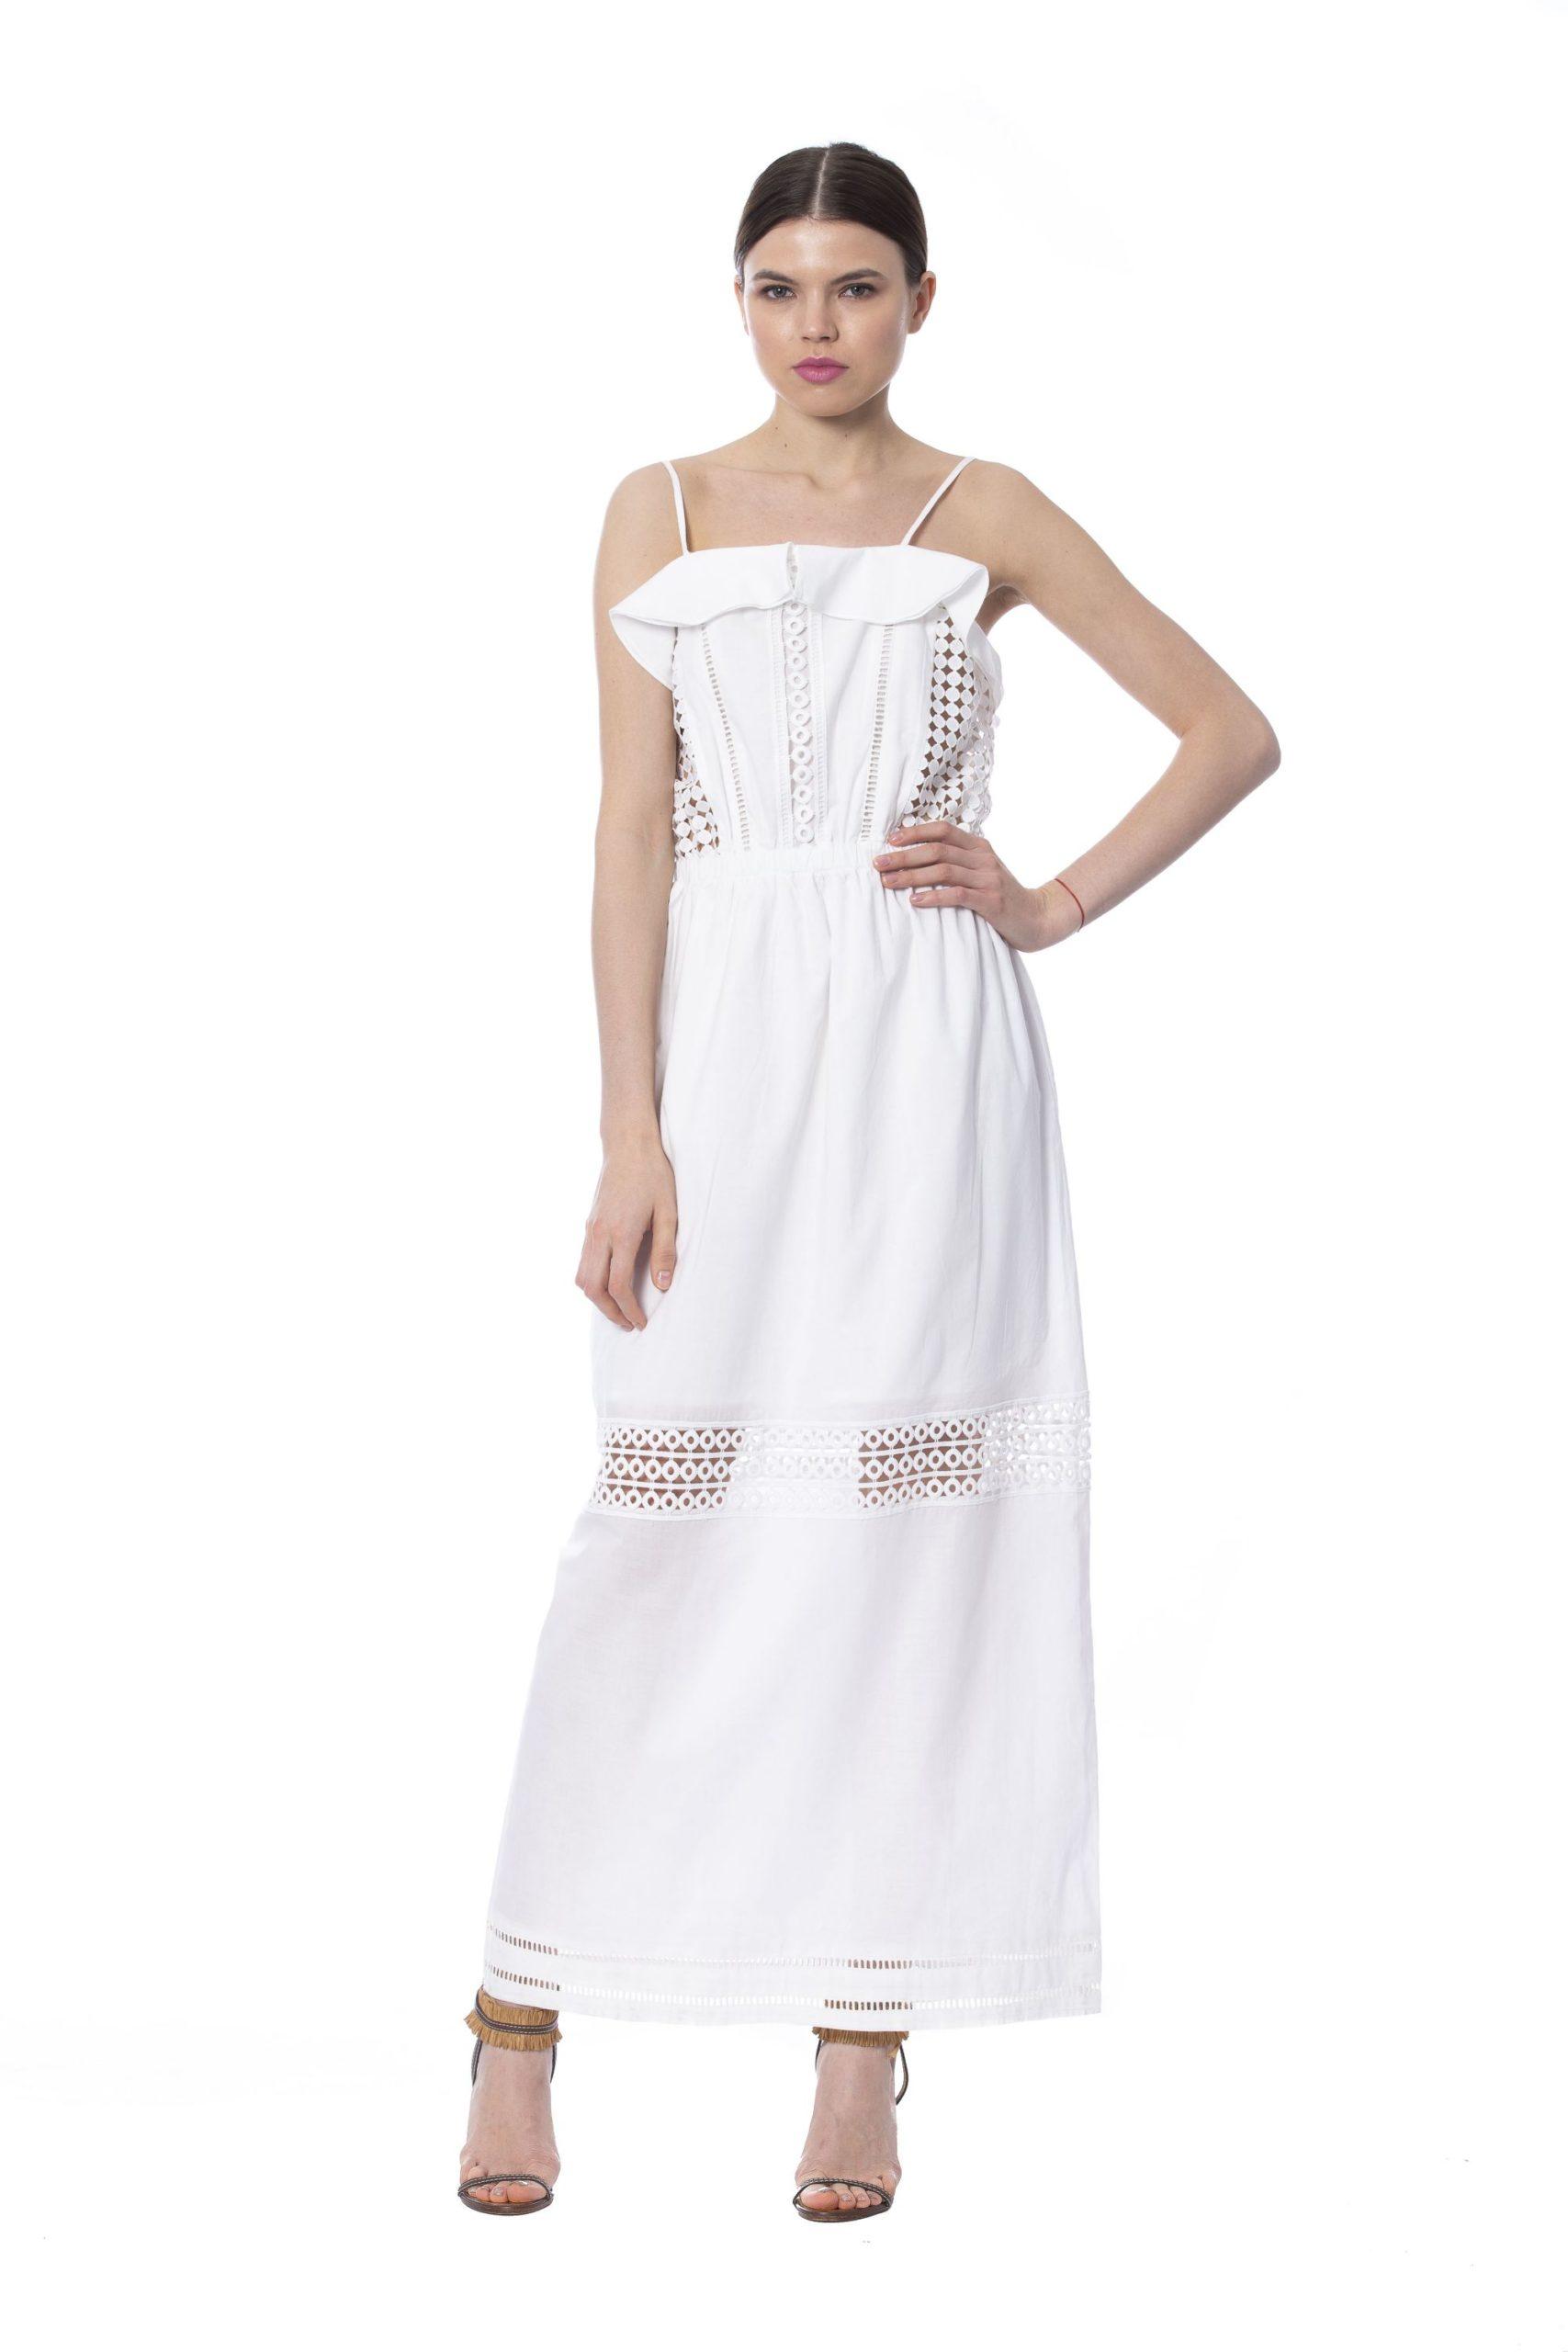 Silvian Heach Women's Dress White SI995364 - XXS